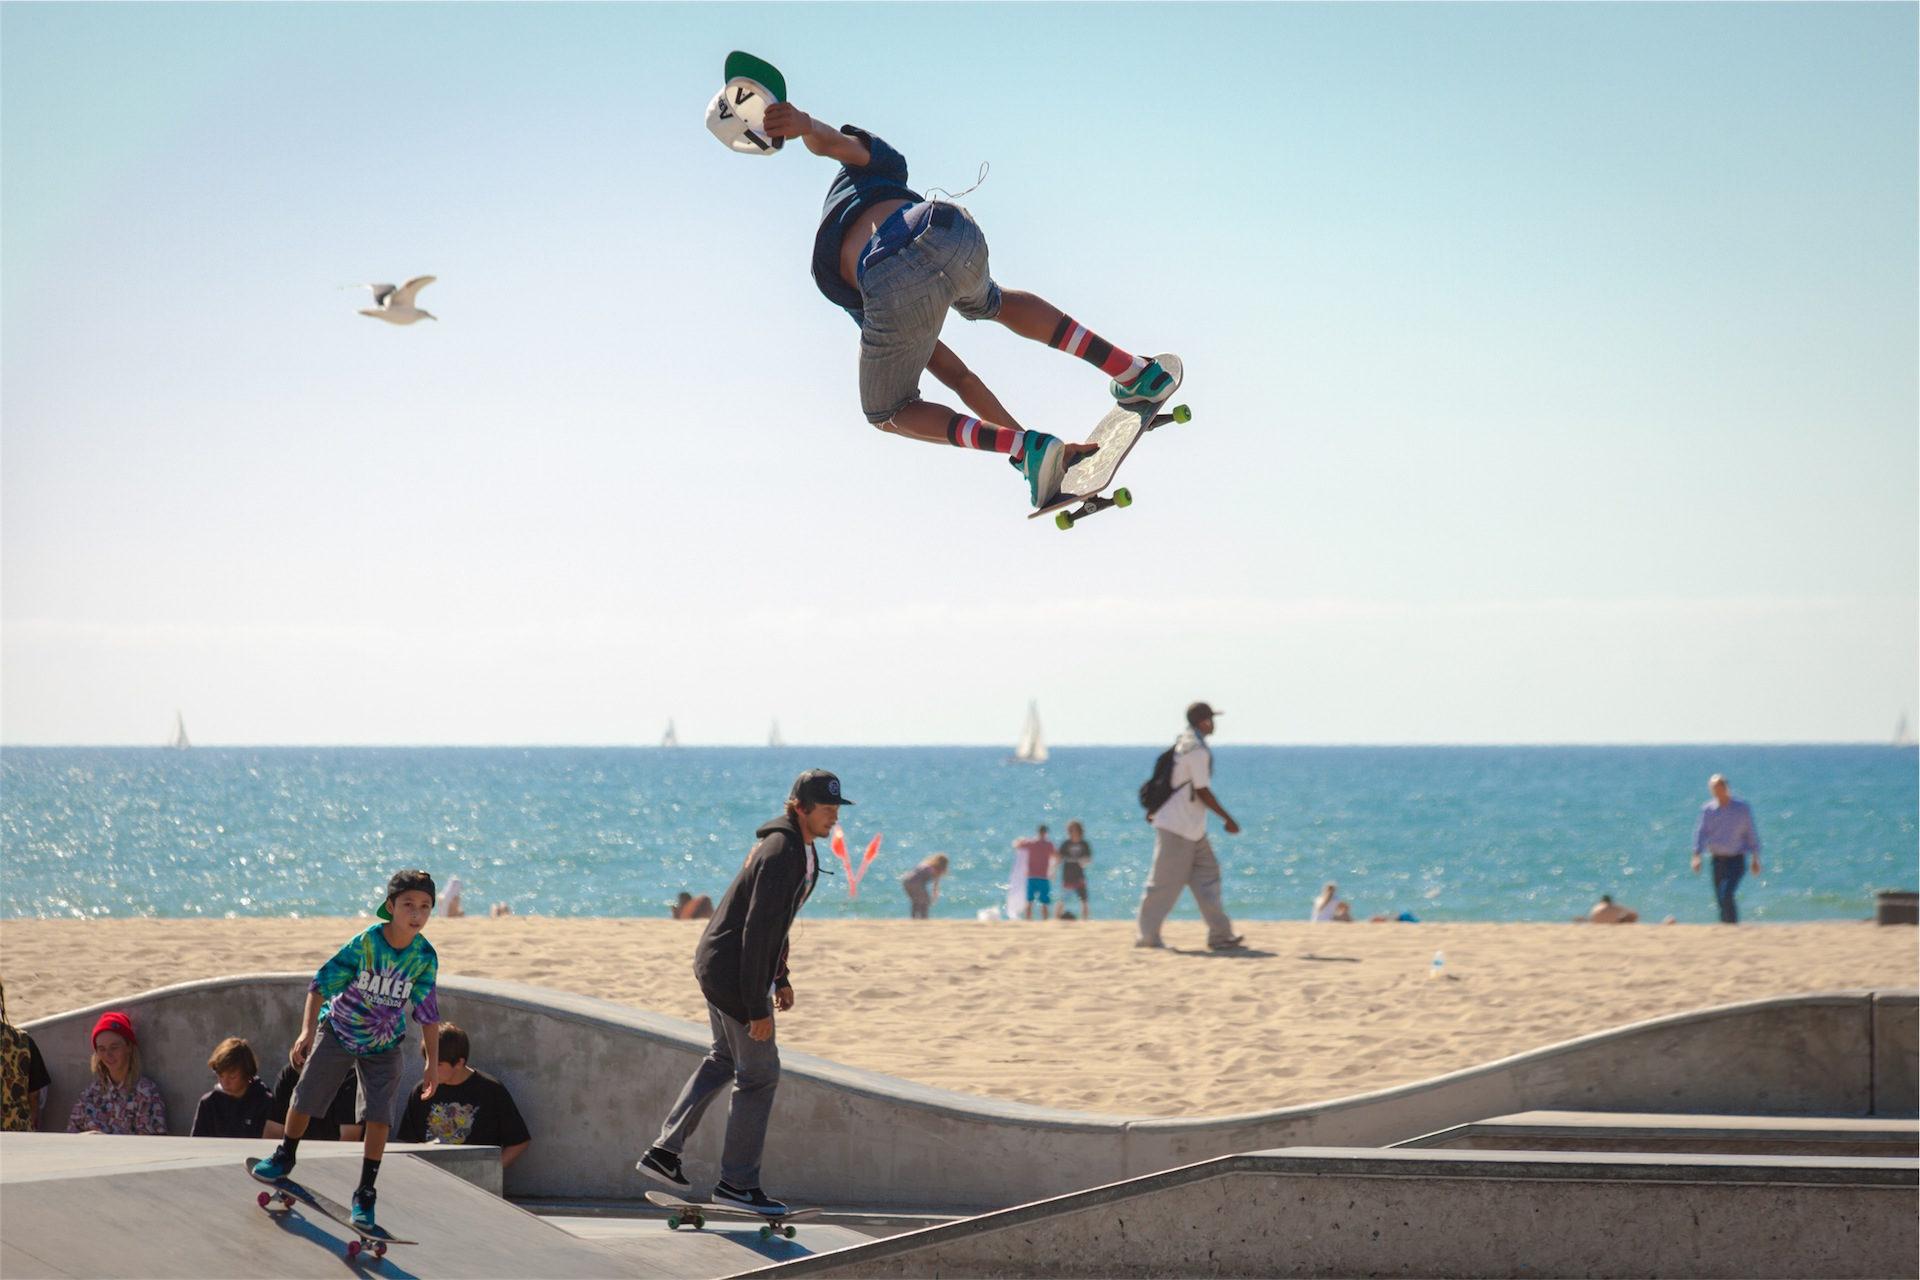 patinar, スケート, ビーチ, 太陽, 楽しい - HD の壁紙 - 教授-falken.com